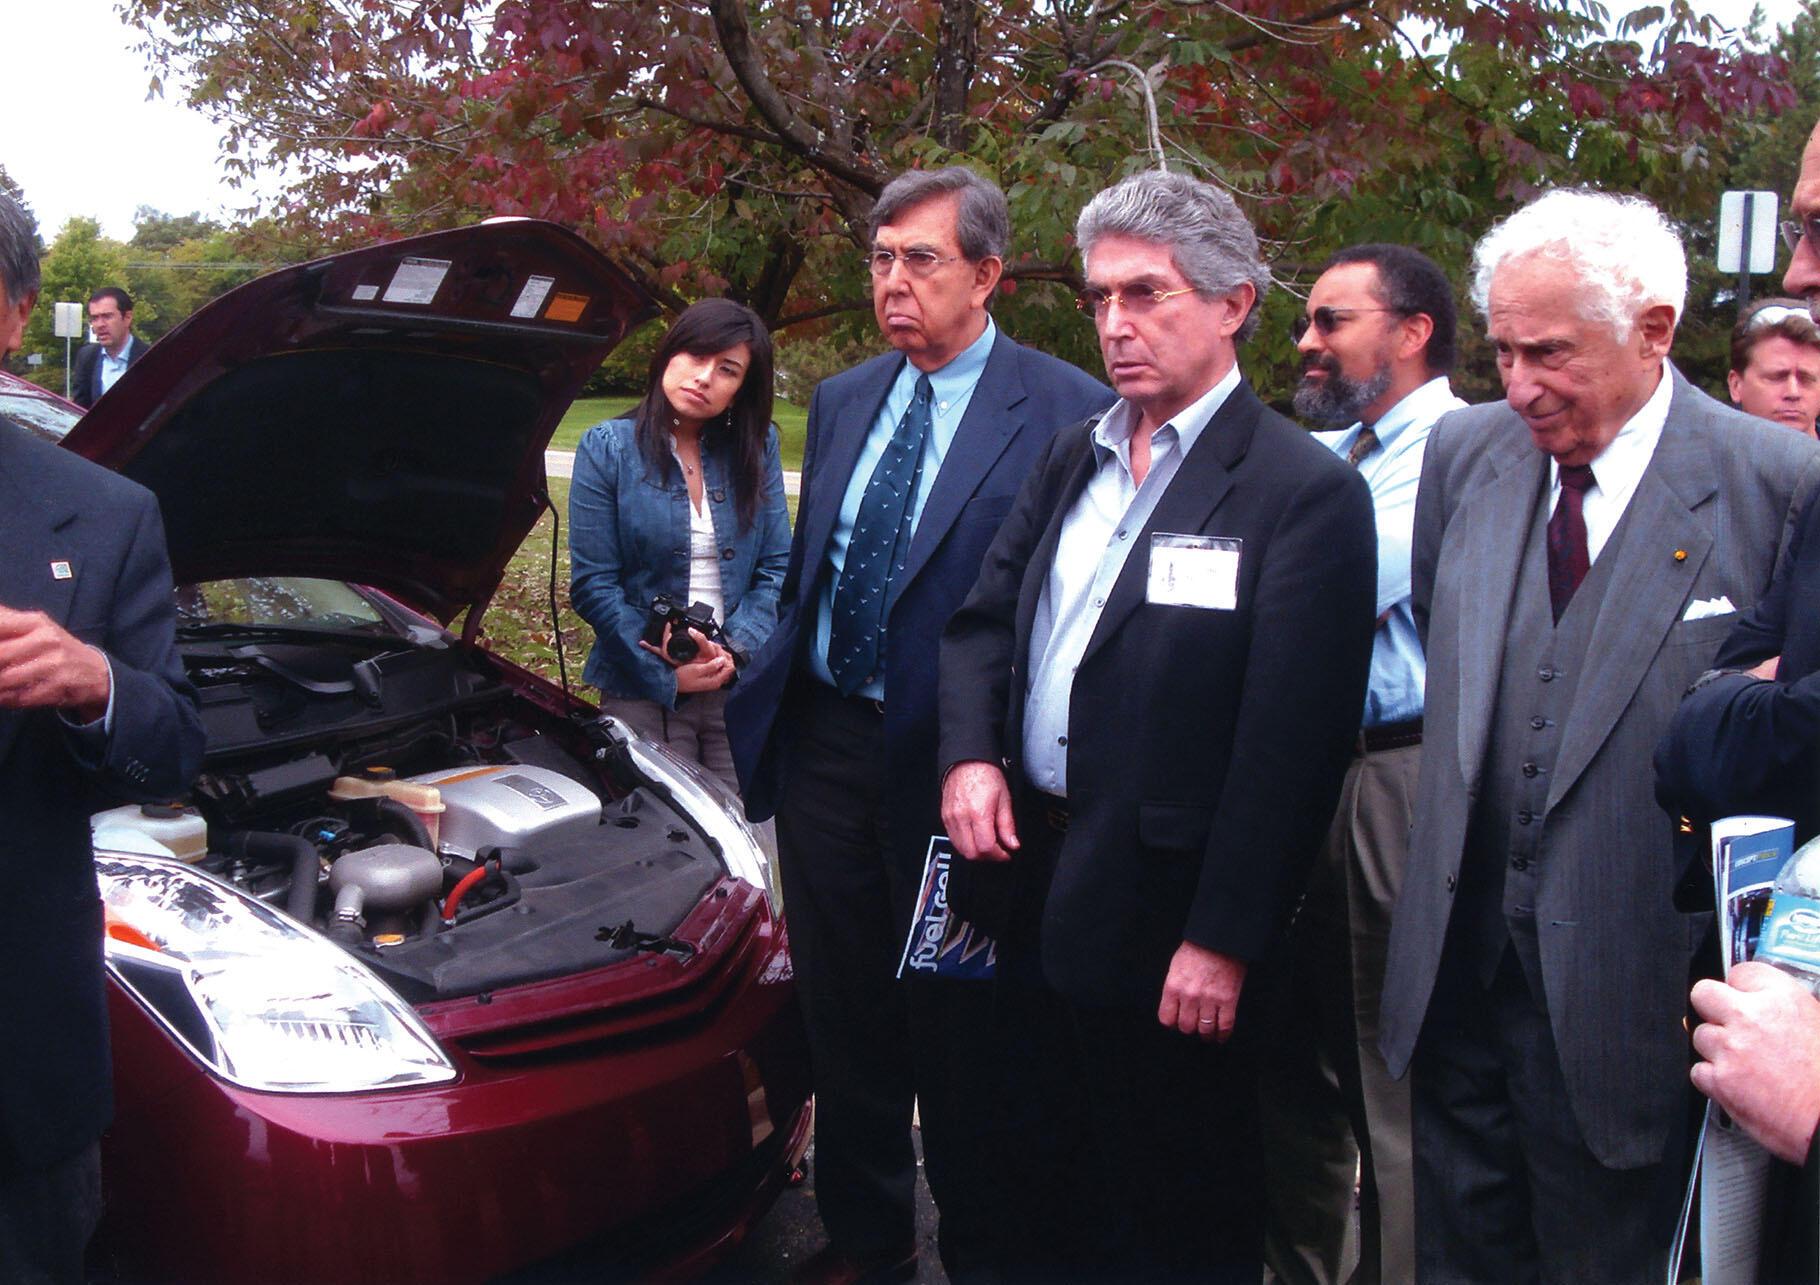 Dionicia Ramos, Cuauhtémoc Cárdenas, Roberto Dobles, Christopher Edley, and Stan Ovshinsky with a hydrogen-powered car. (Photo by Cristel Heinrich Bettoni.)